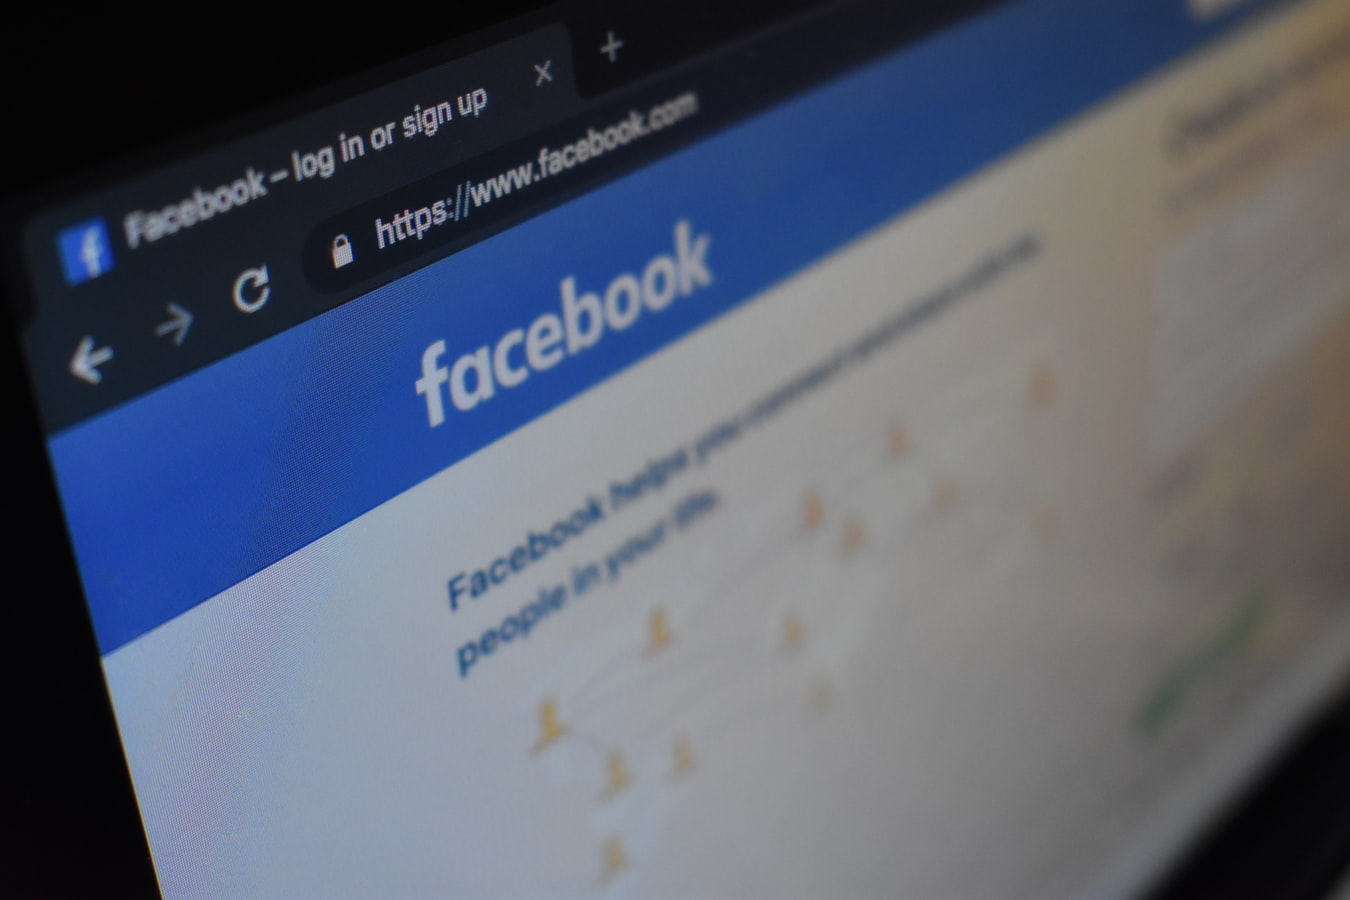 Facebook: Νέα λειτουργία «καθαρίζει» το ιστορικό αλλά δεν το διαγράφει